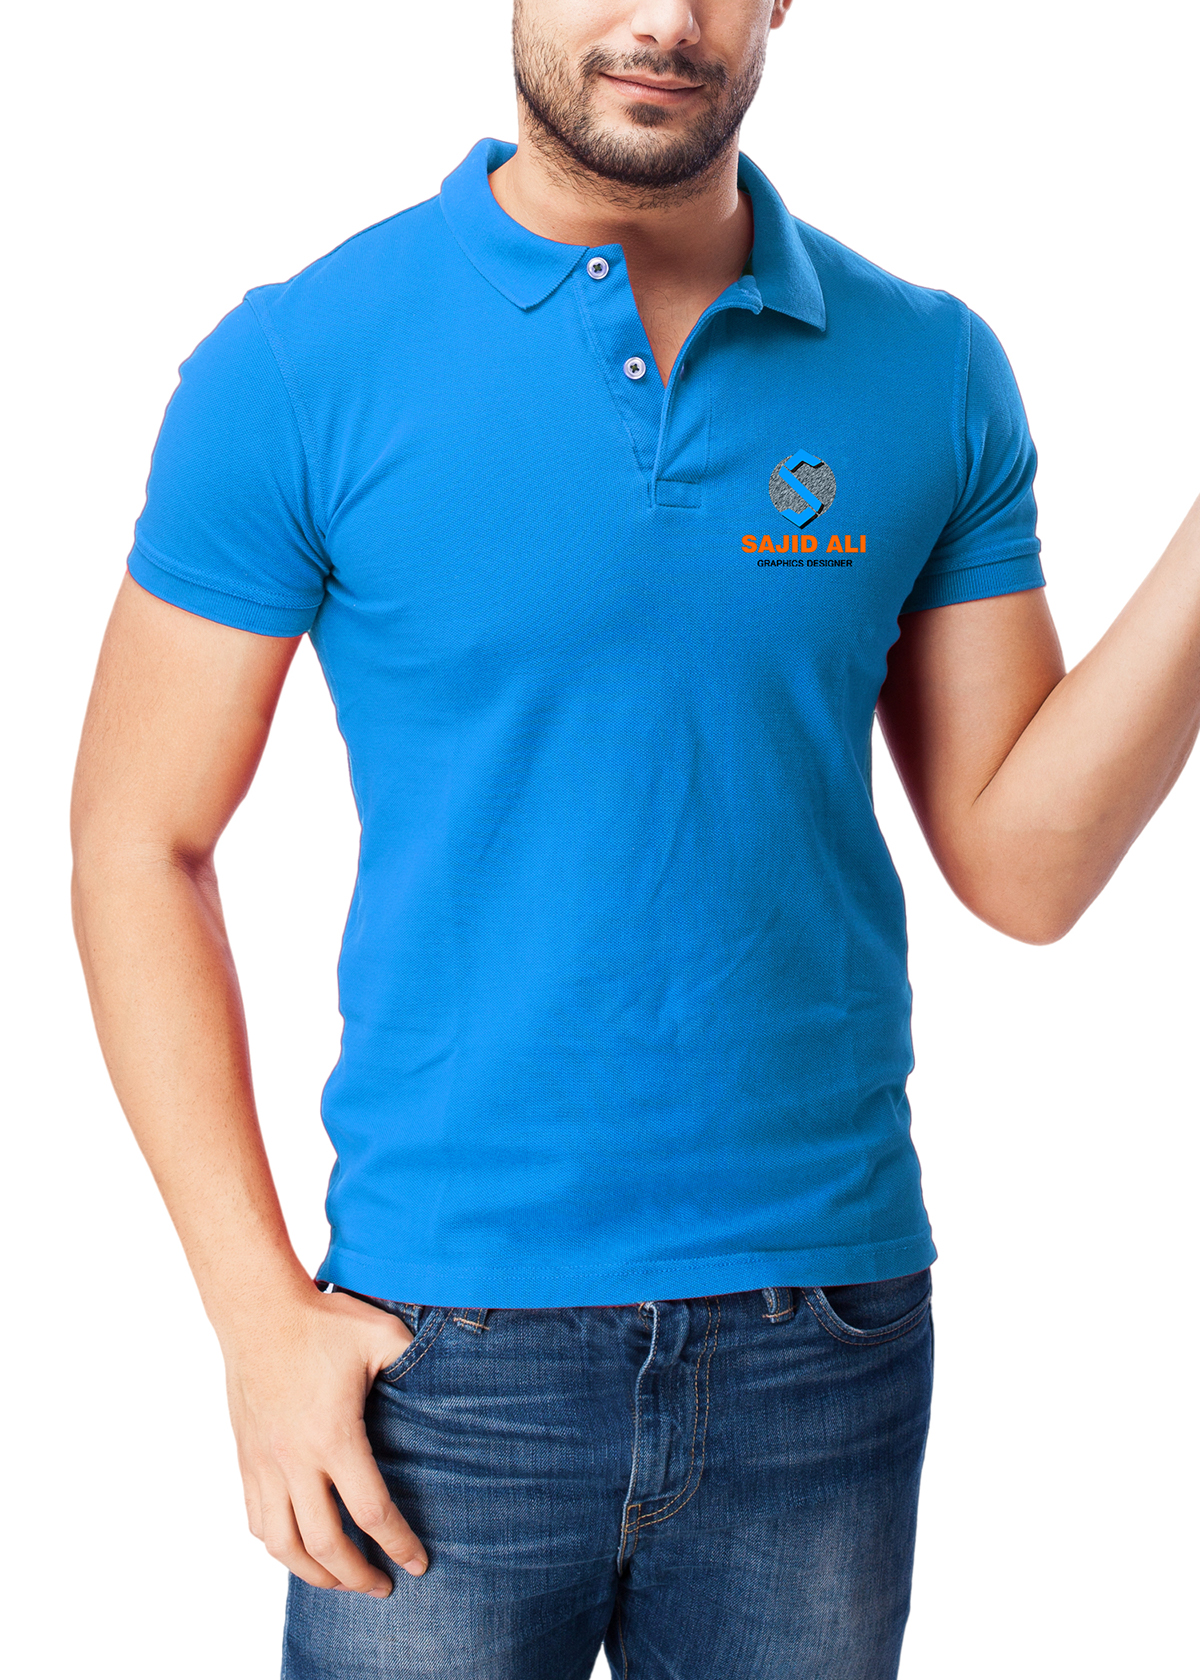 Mockup Camiseta Polo a54192856641a